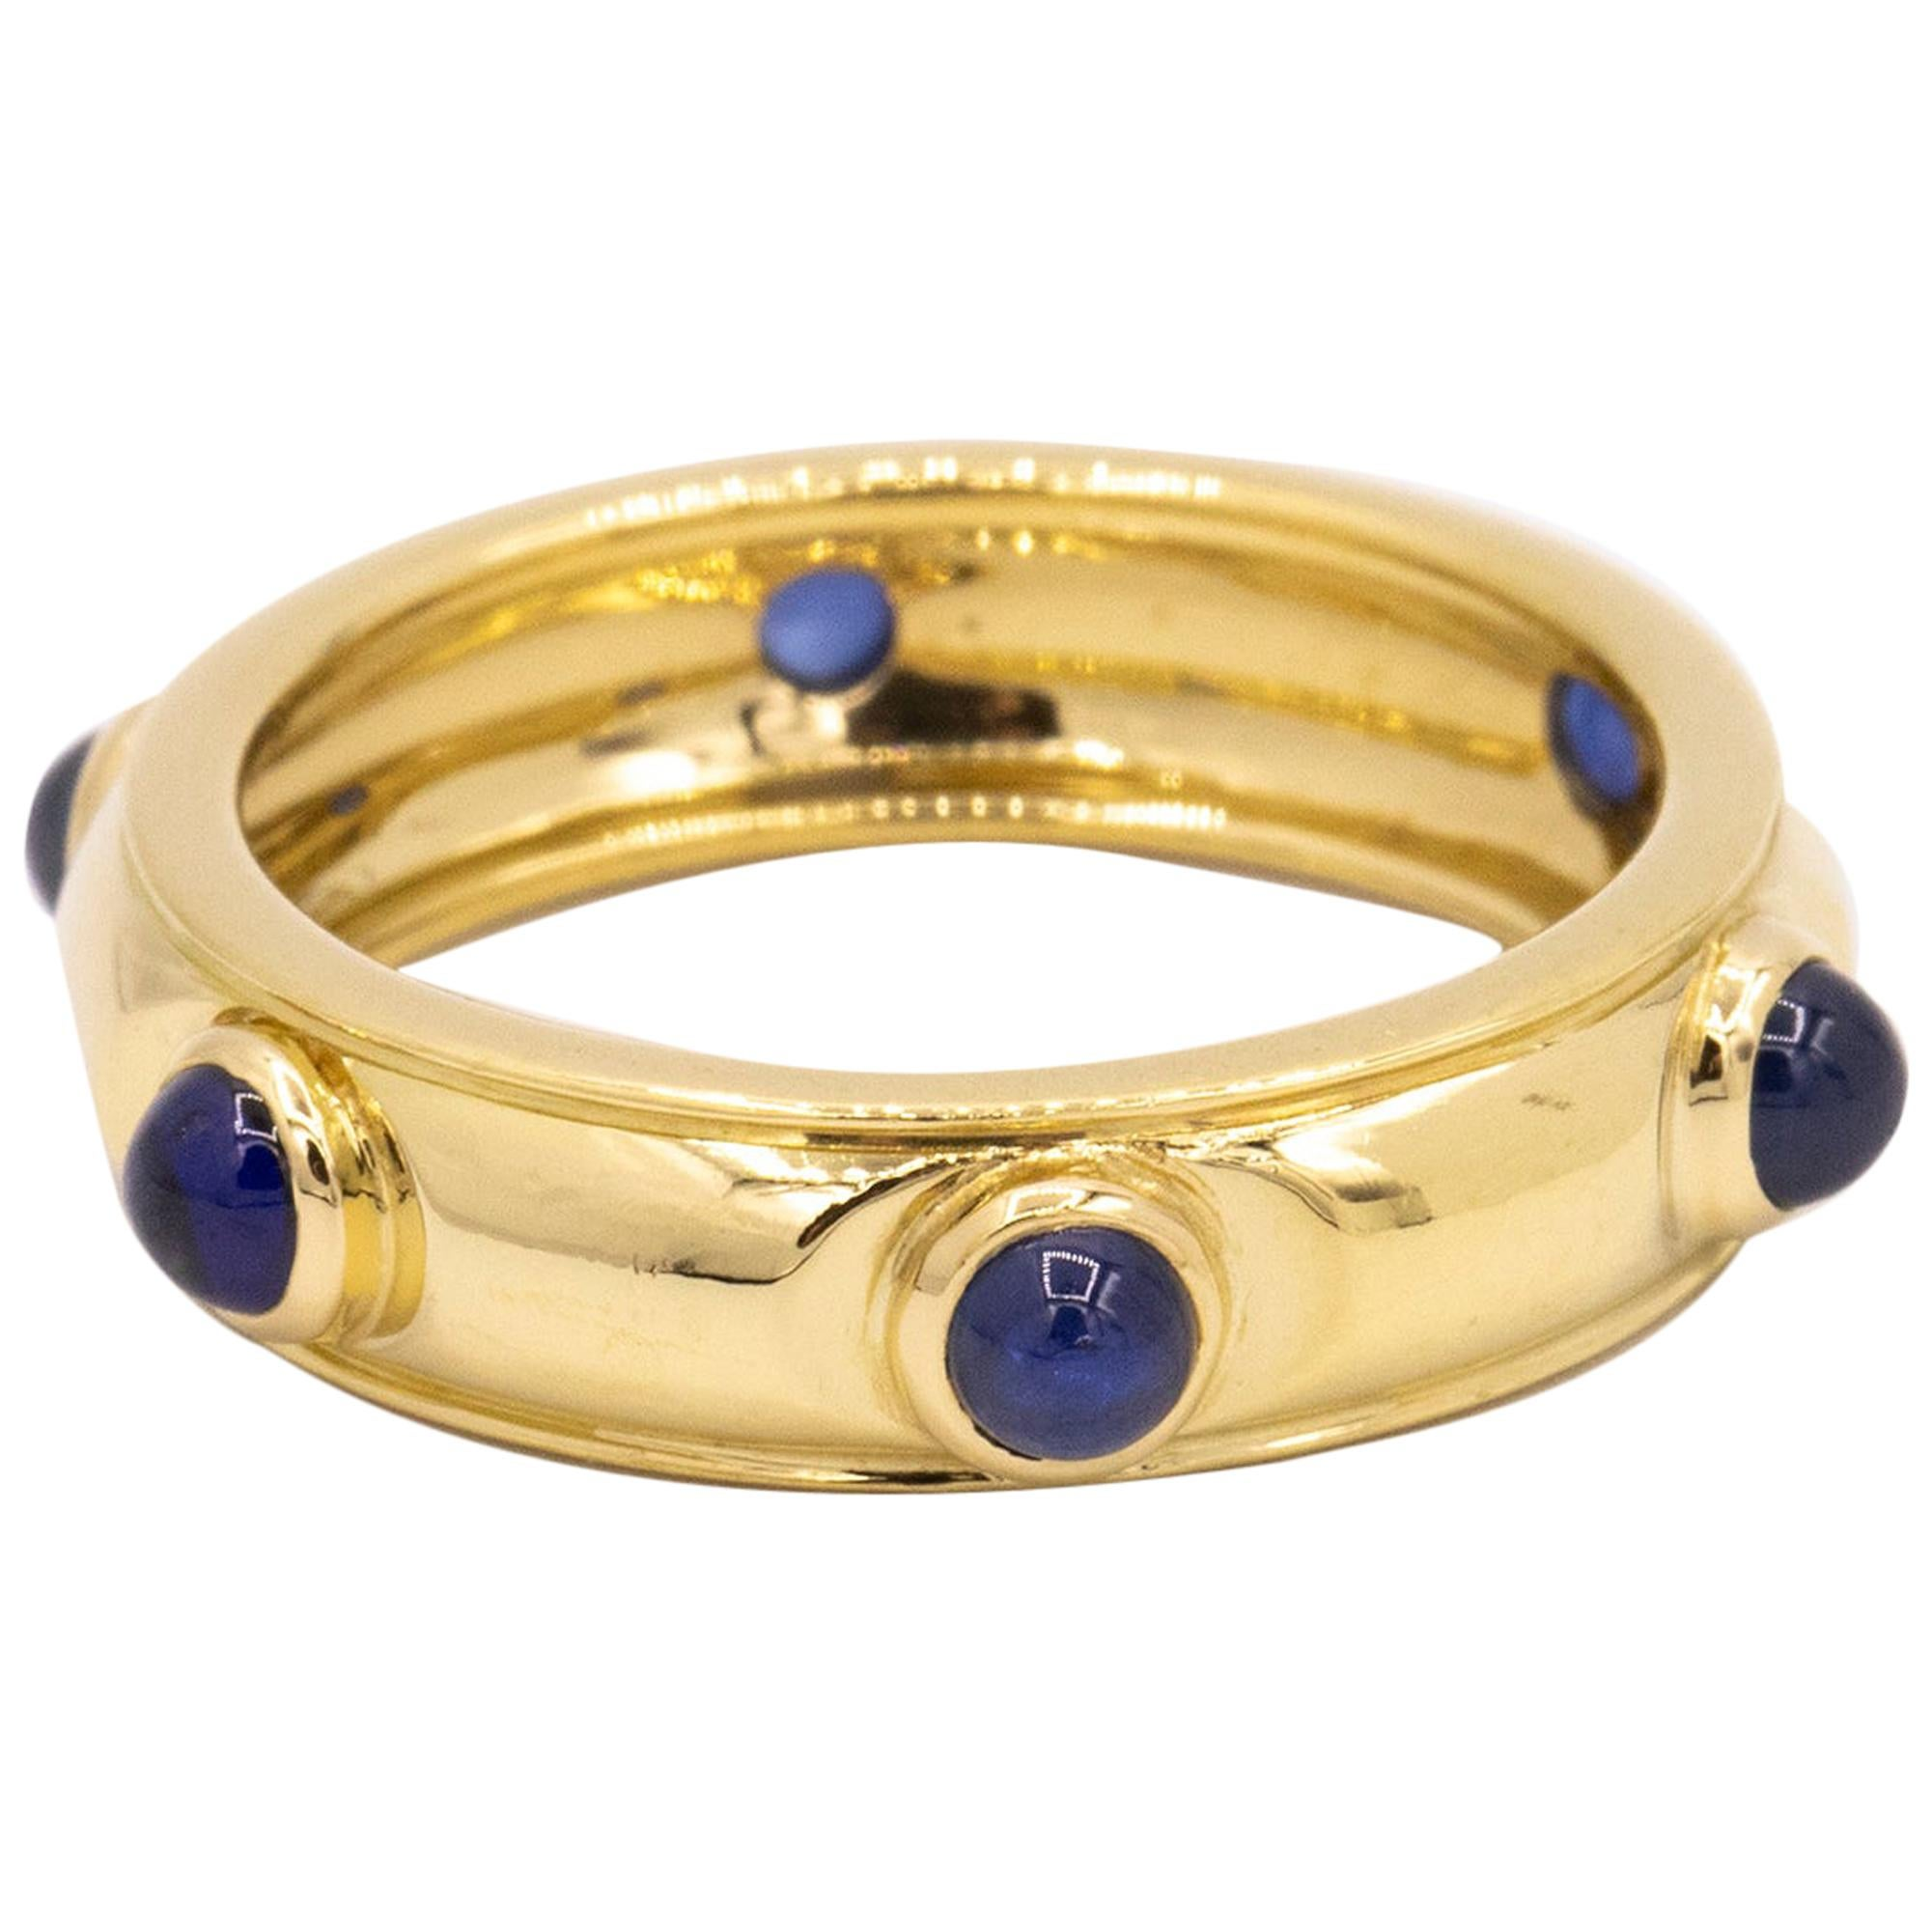 Tiffany & Co. Cabochon Sapphire Ring